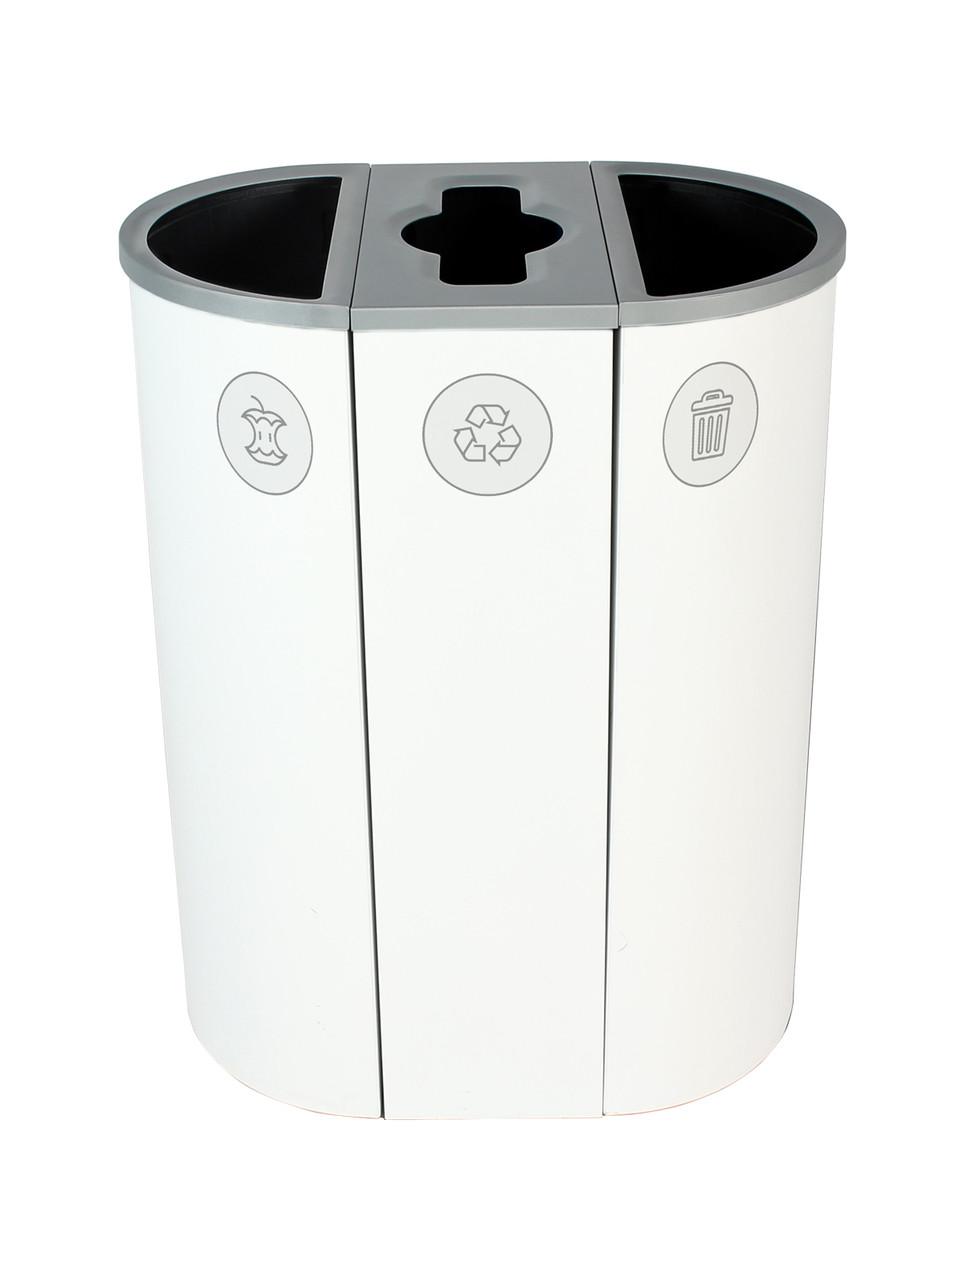 26 Gallon Spectrum Triple Recycling Station White 8107116-424